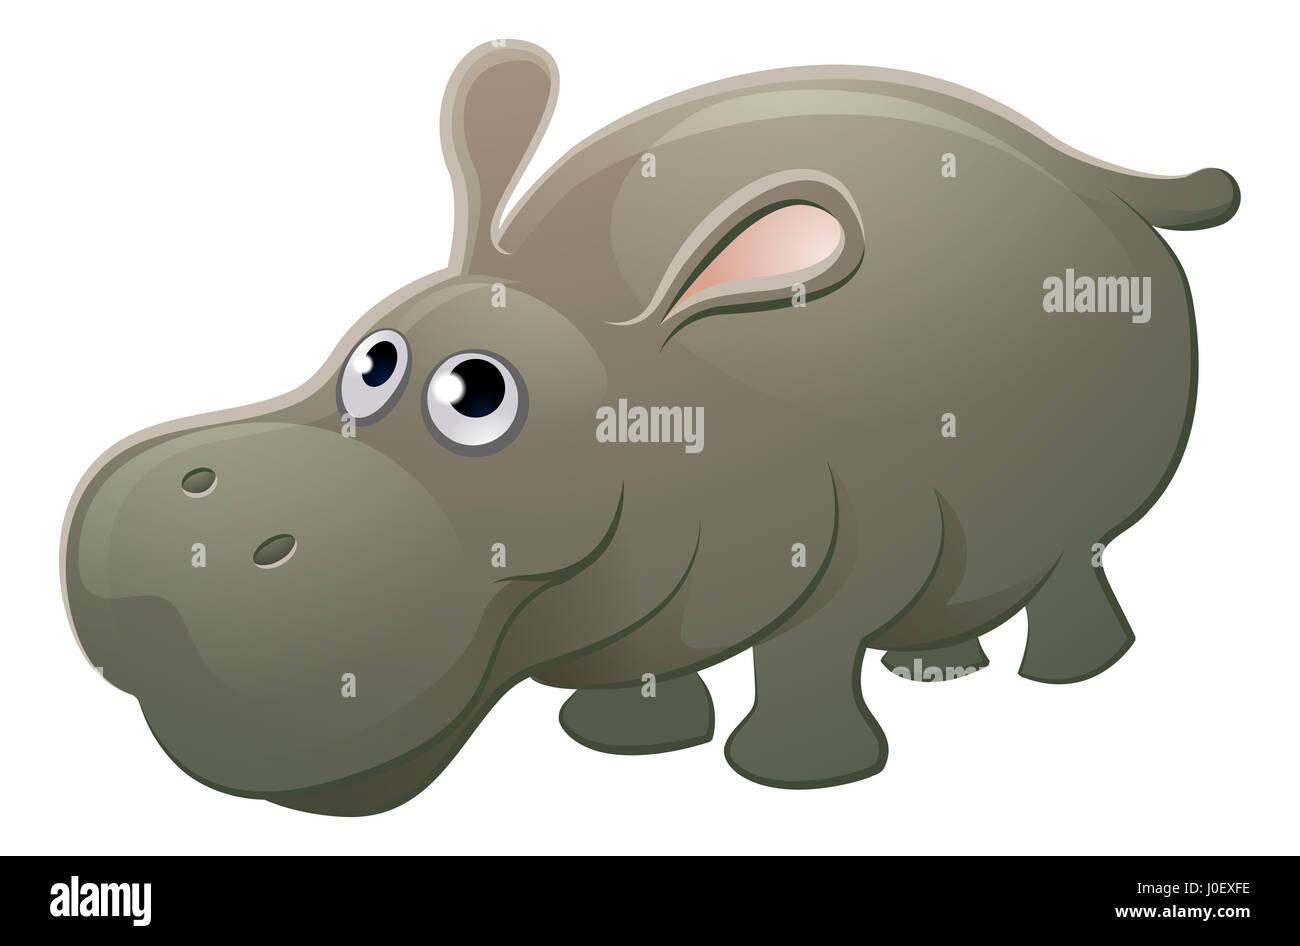 hight resolution of a cute hippo hippopotamus animal cartoon character mascot stock image